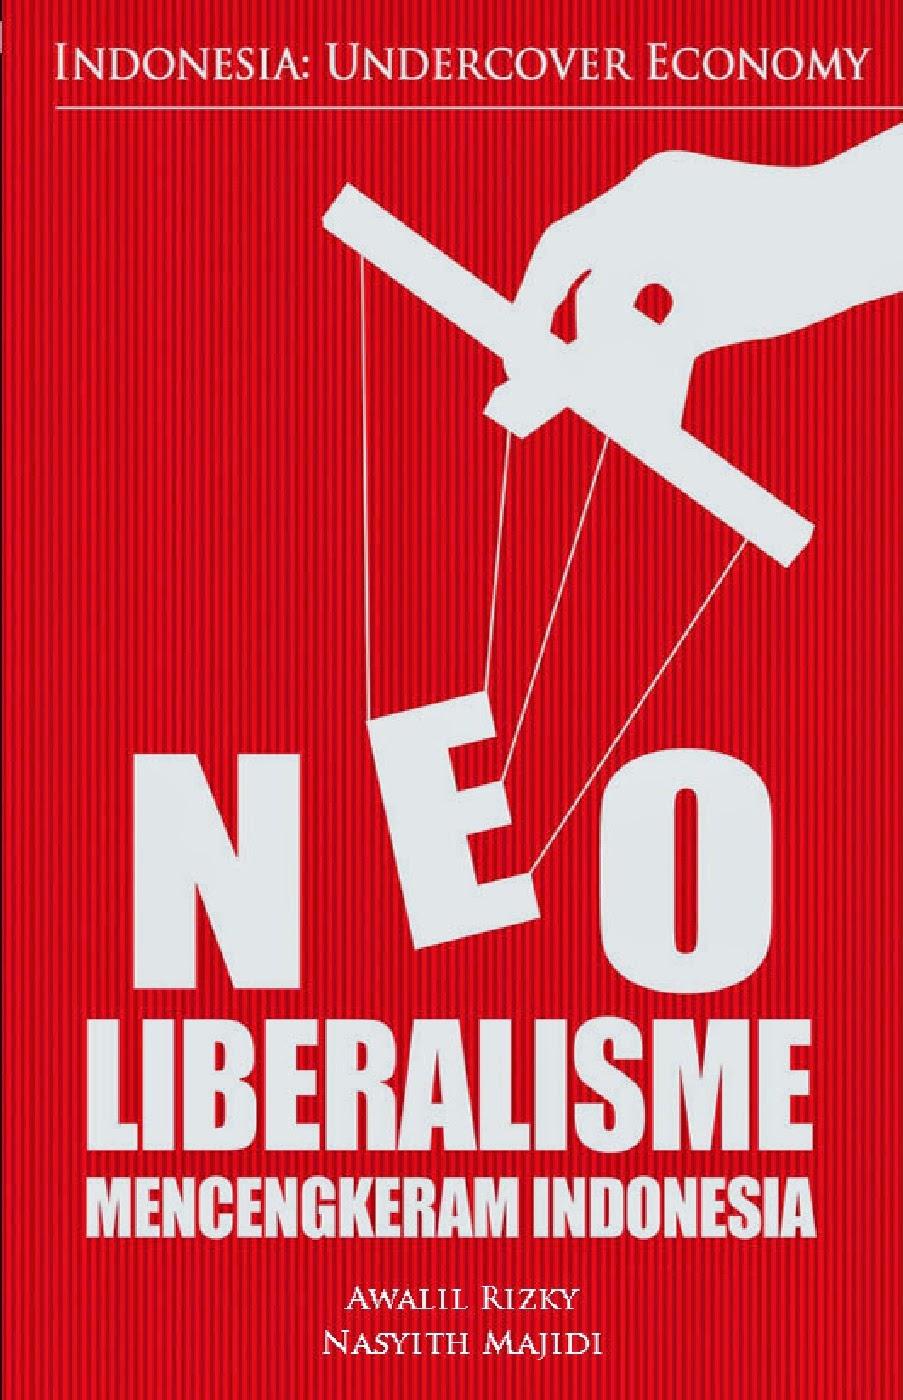 Awalil Rizky Dan Nasyith Majidi, Neoliberalisme Mencengkeram Indonesia  (jakarta: E Publishingpany,